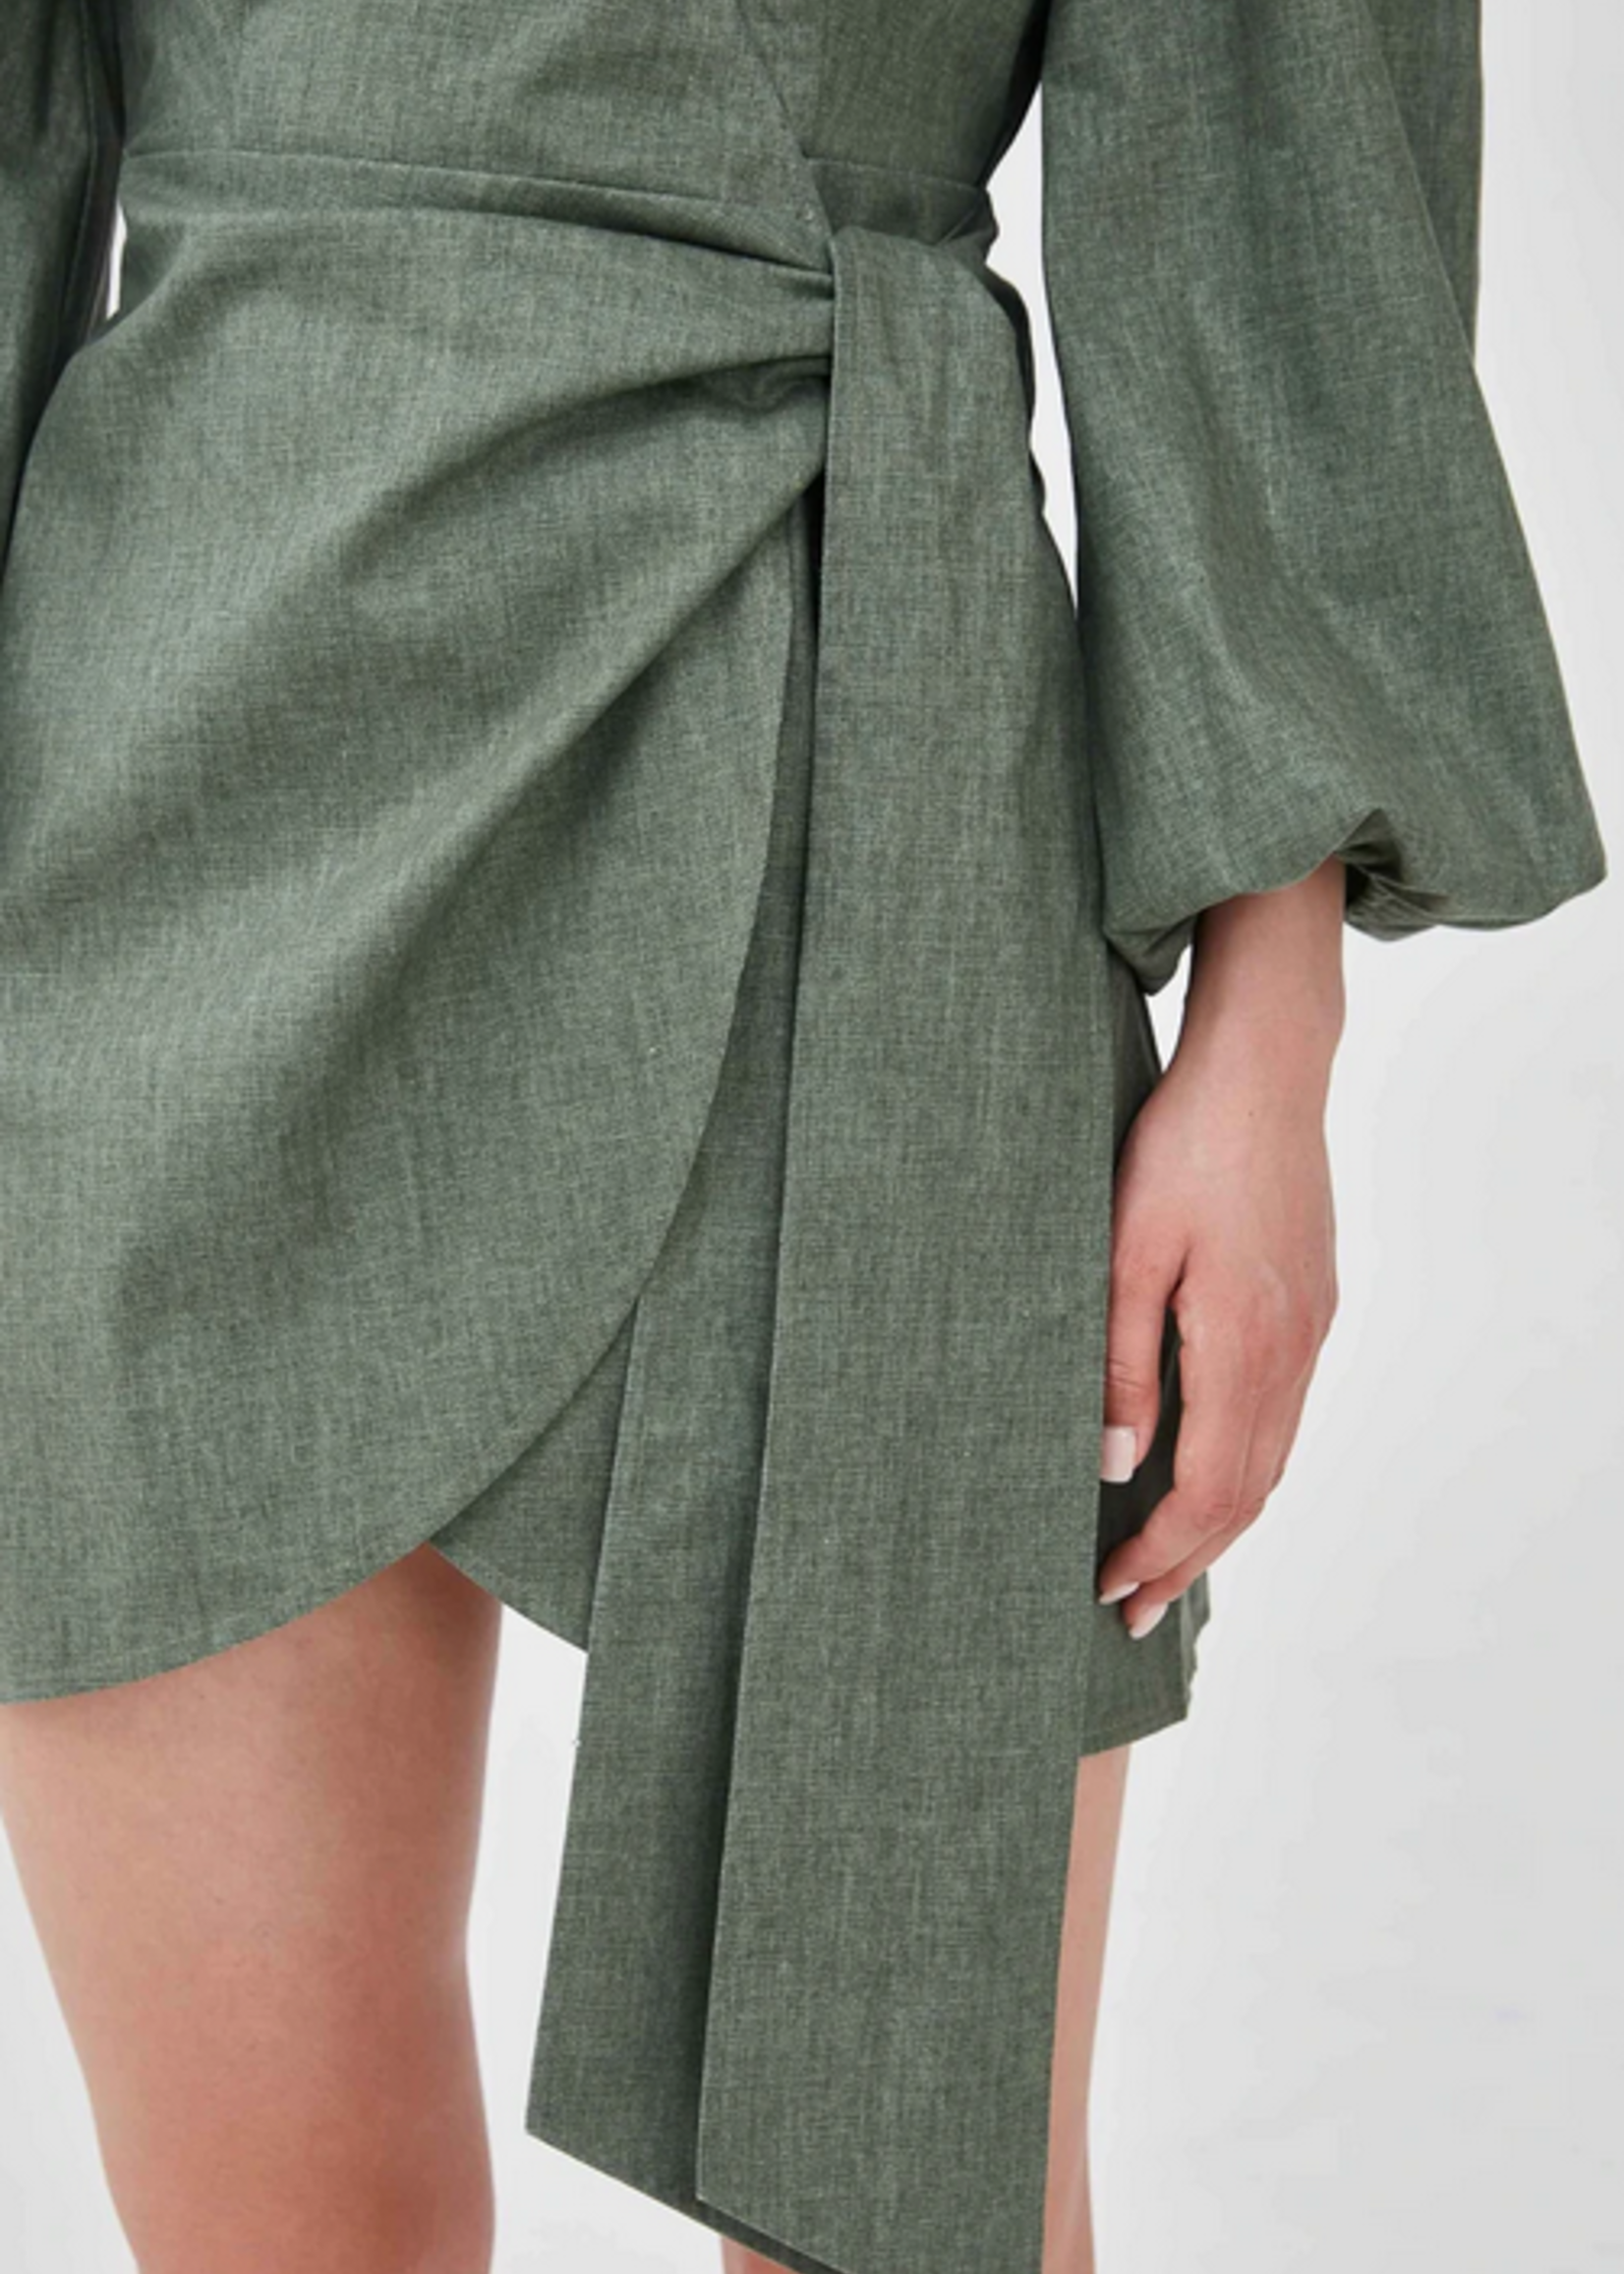 Elitaire Boutique Sasha Dress in Sage